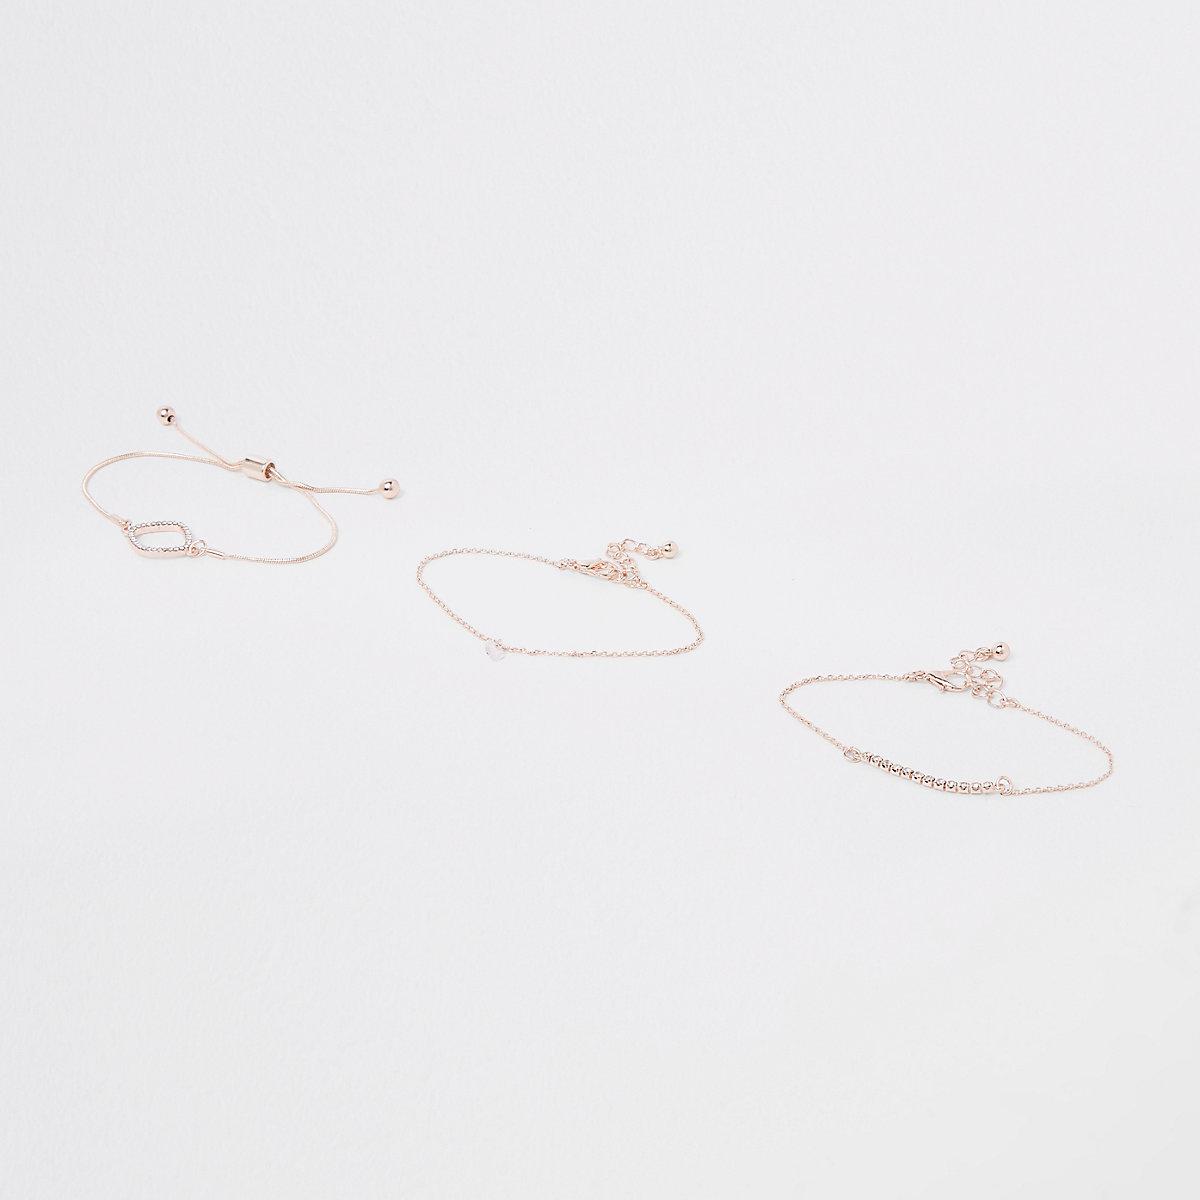 Rose gold rhinestone paved bracelet pack